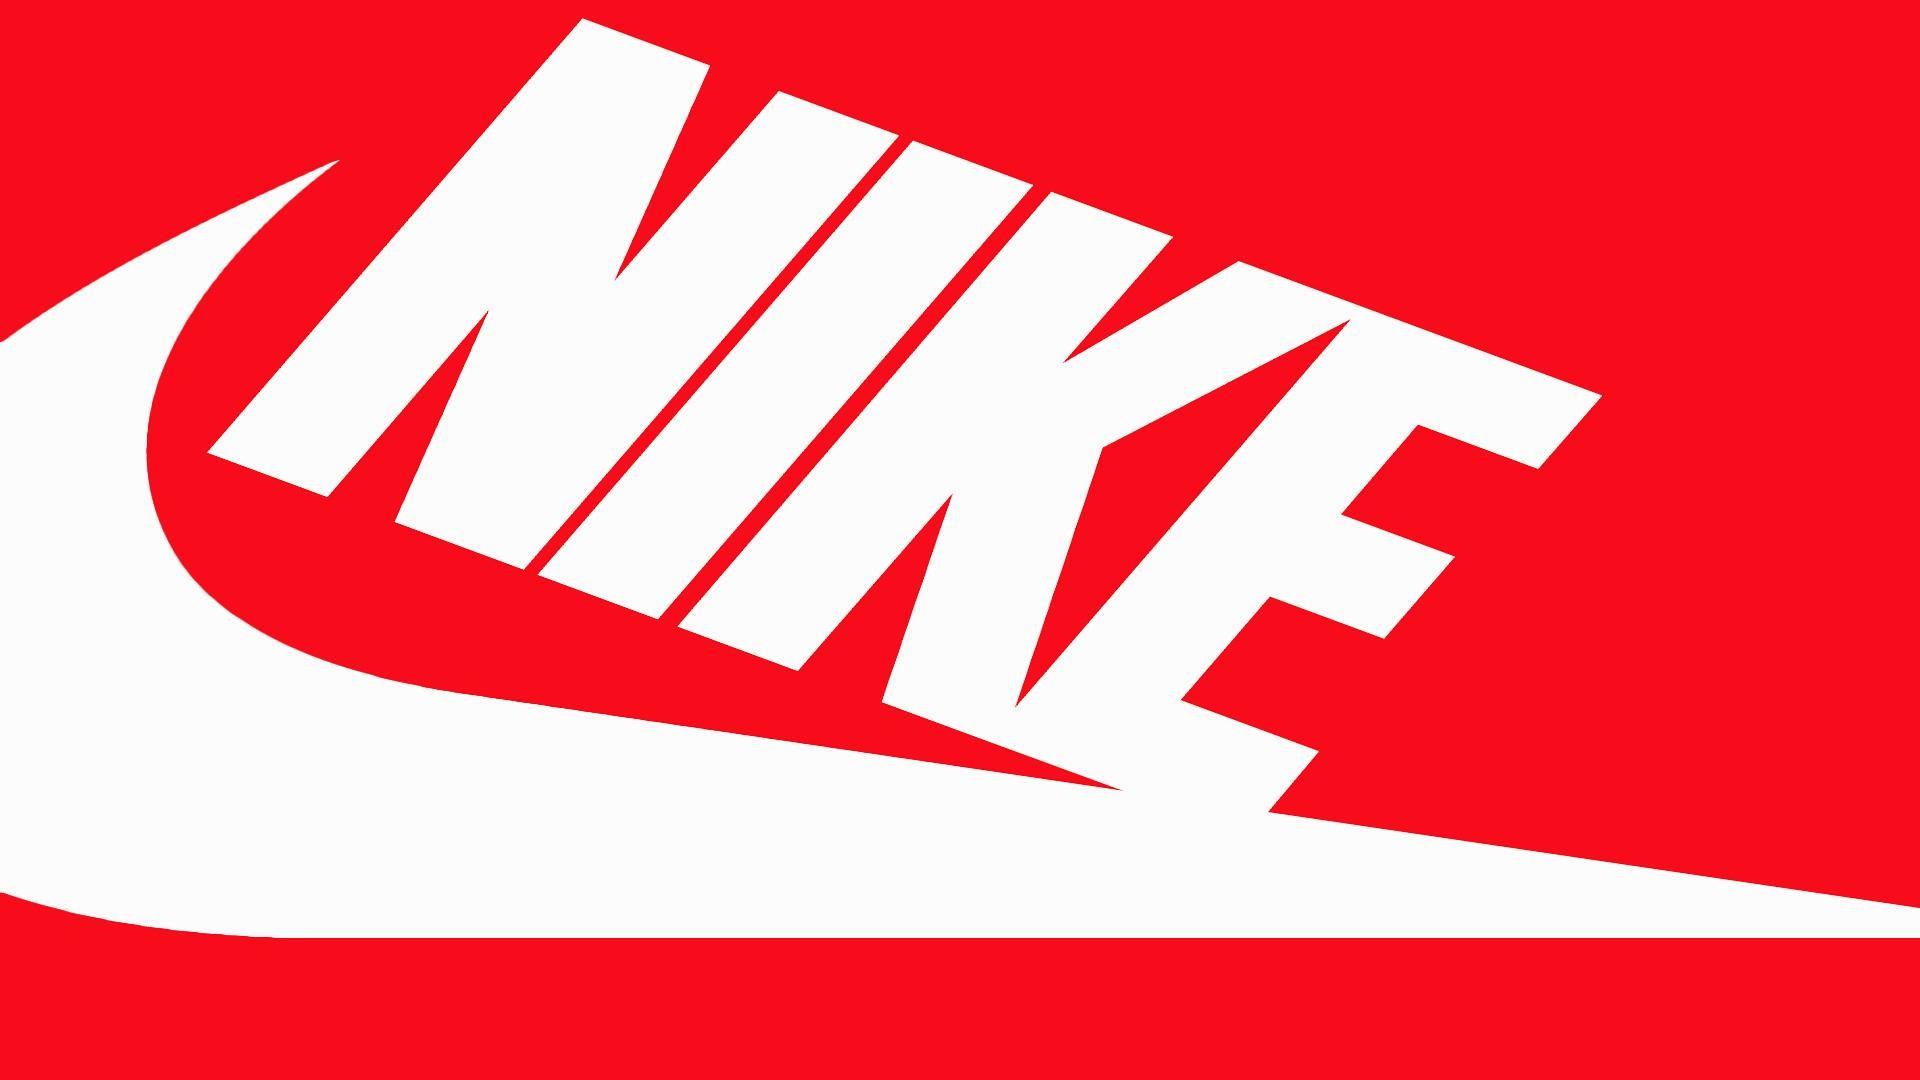 Cool-Nike-logo-HD-wallpaper